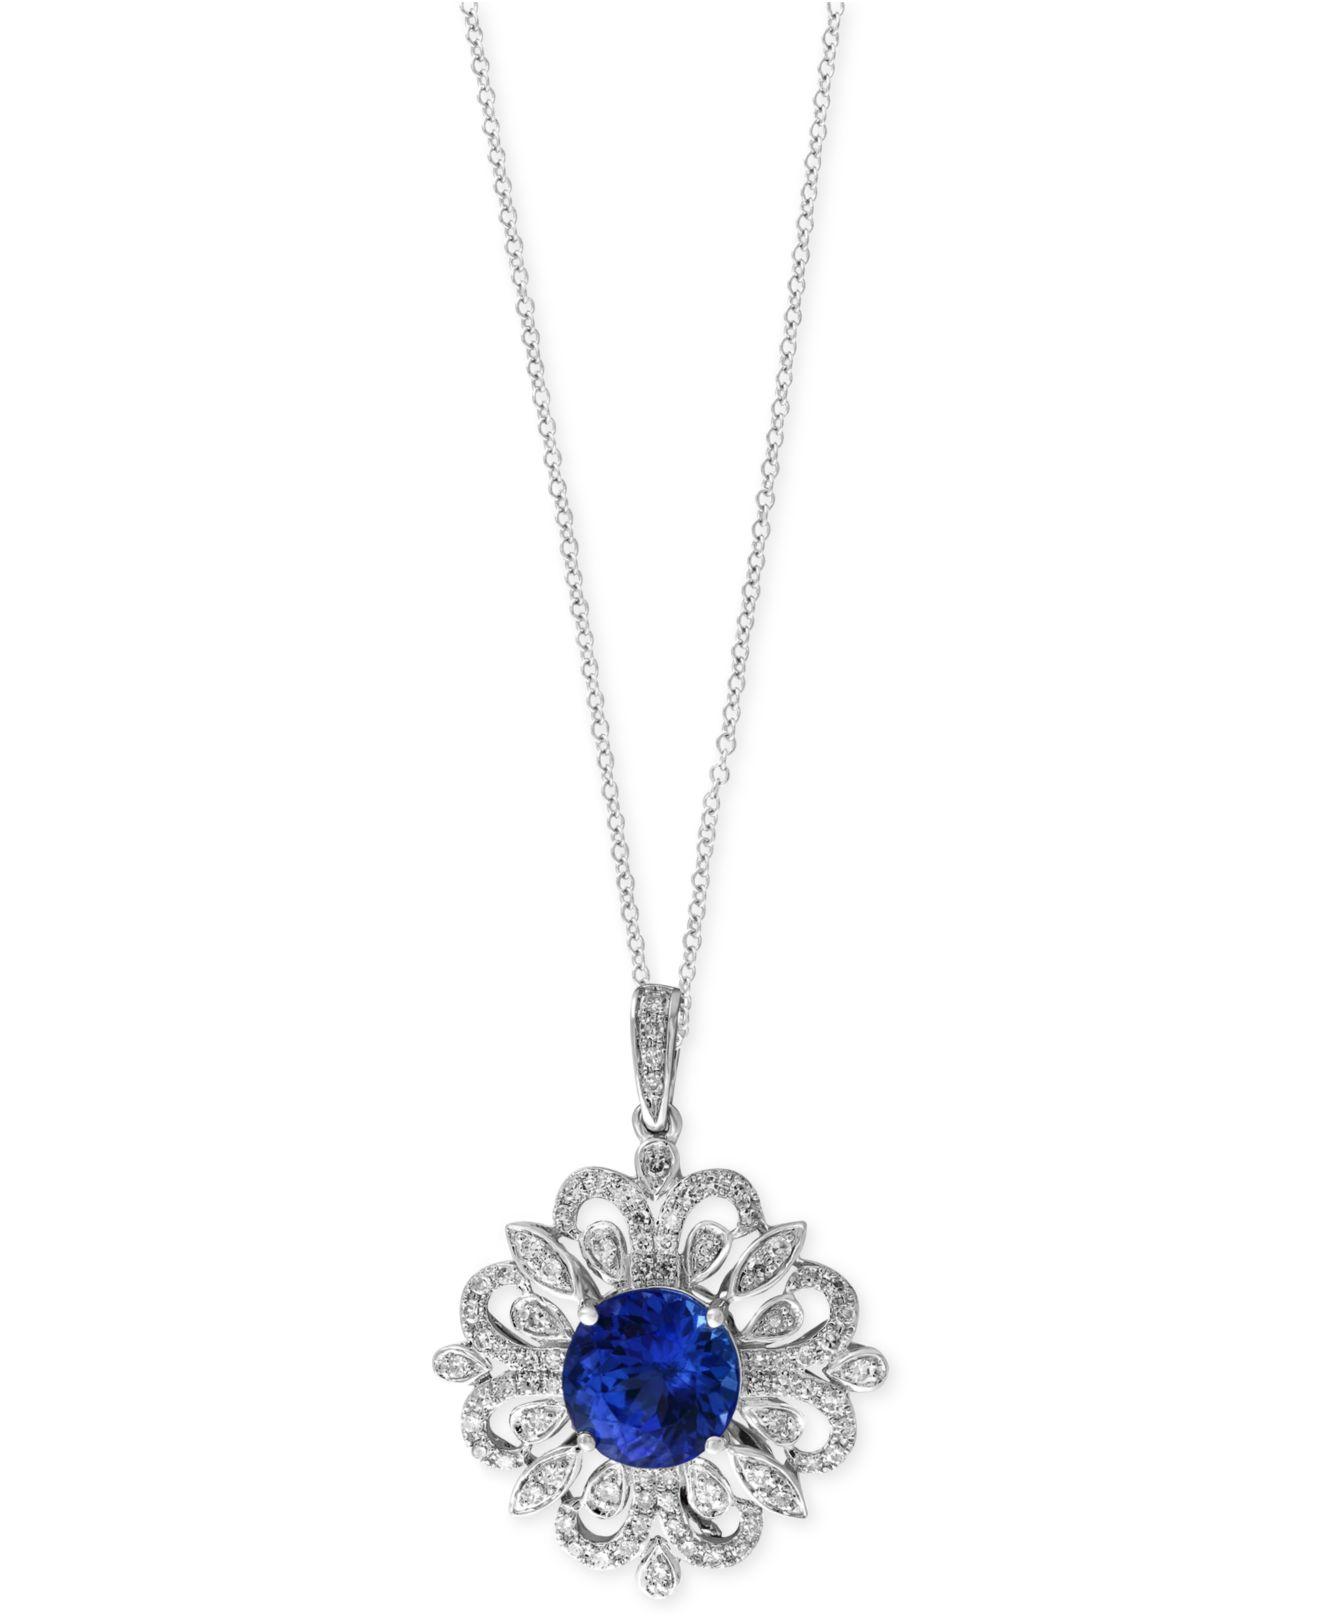 Effy Diamond Necklace